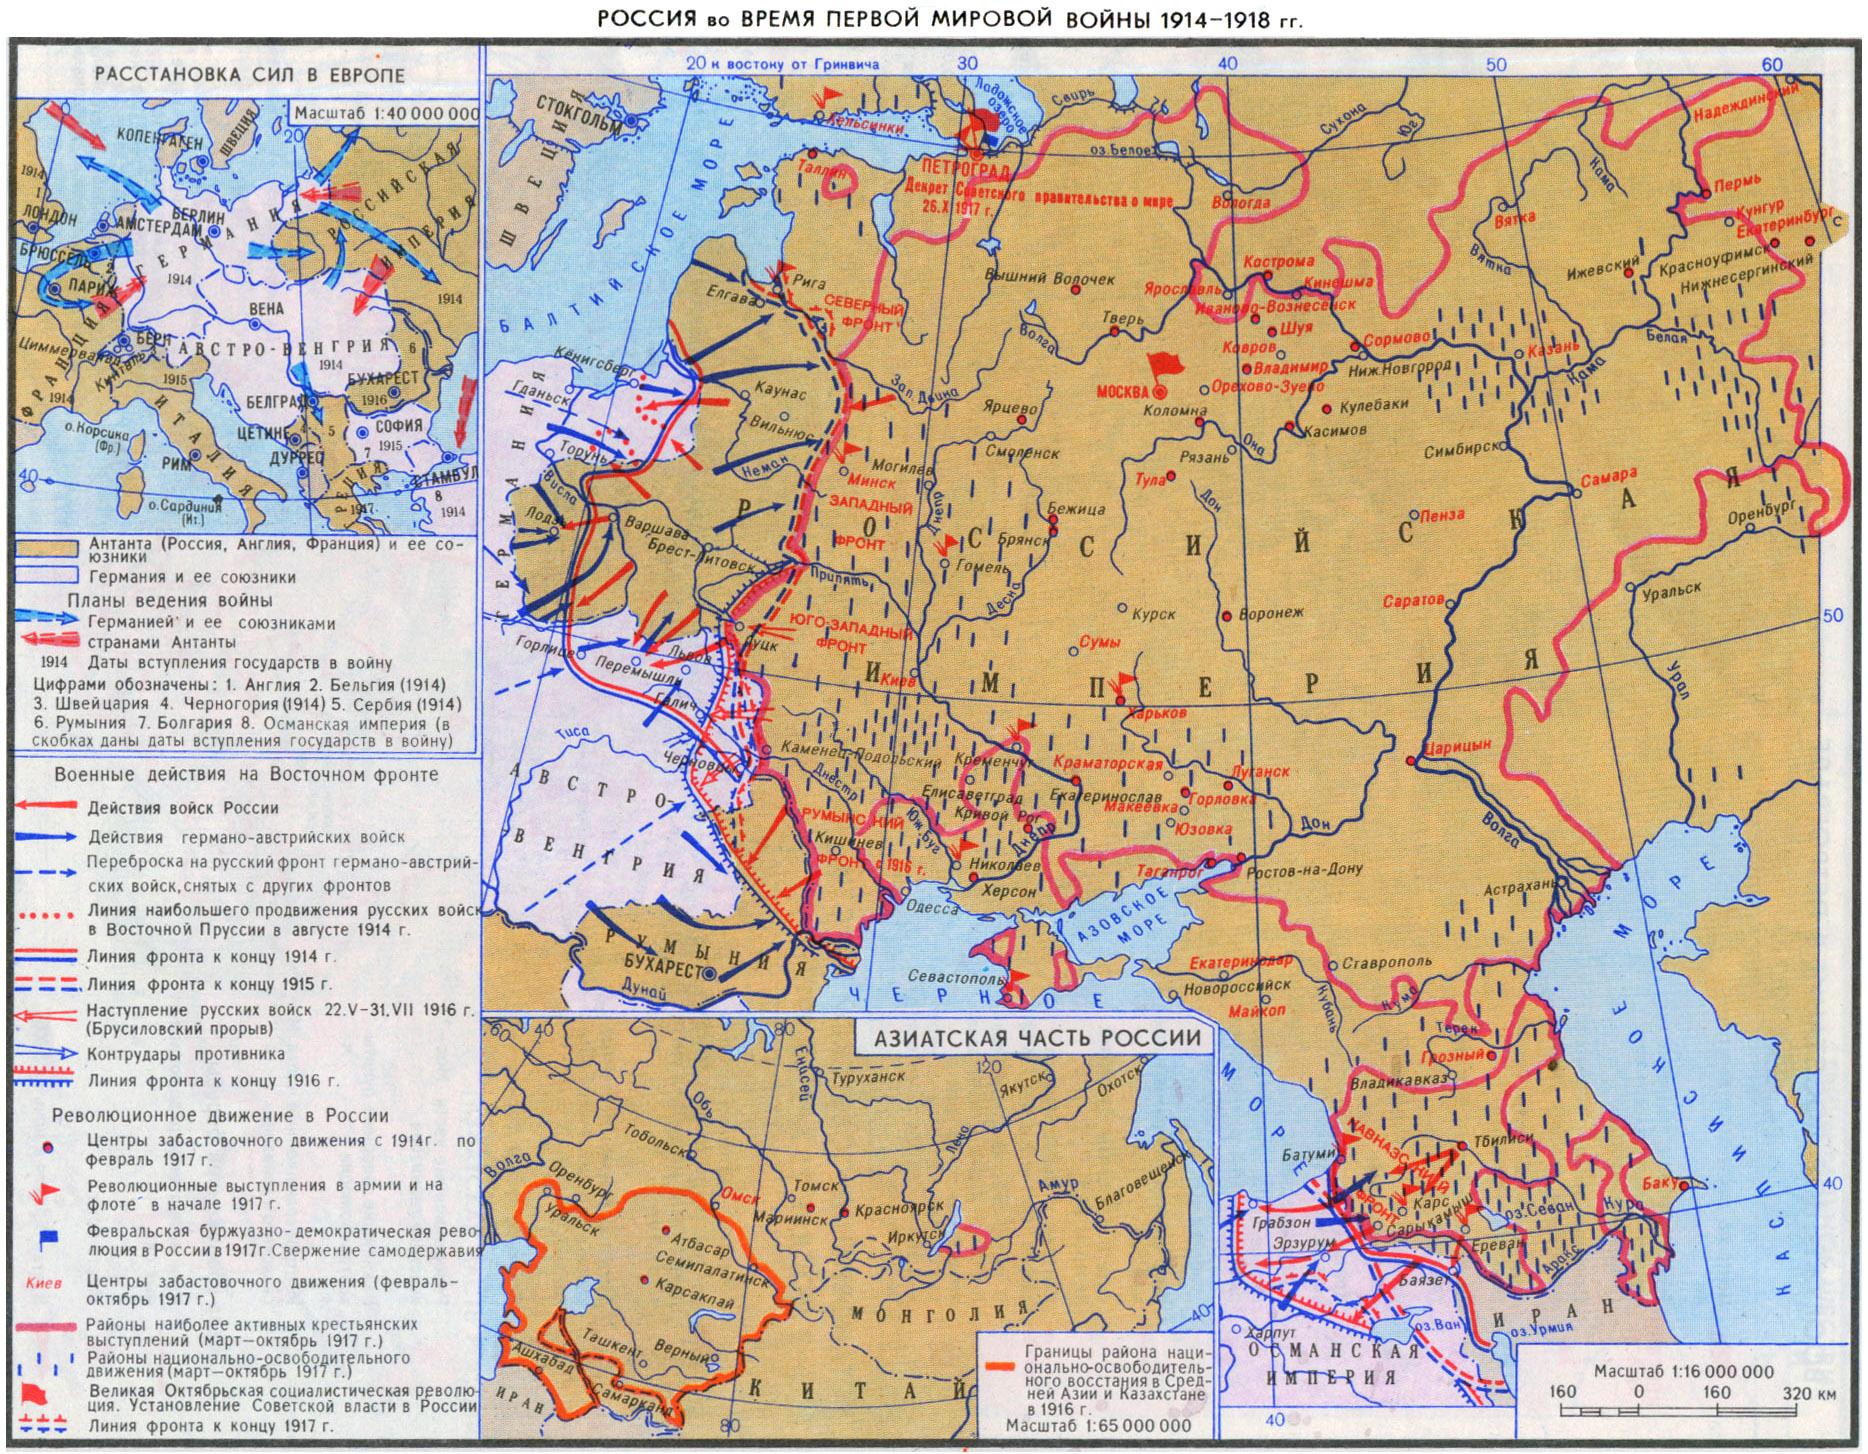 40_Rossiya-v-Pervoj-mirovoj-vojne-1914-1918-gg